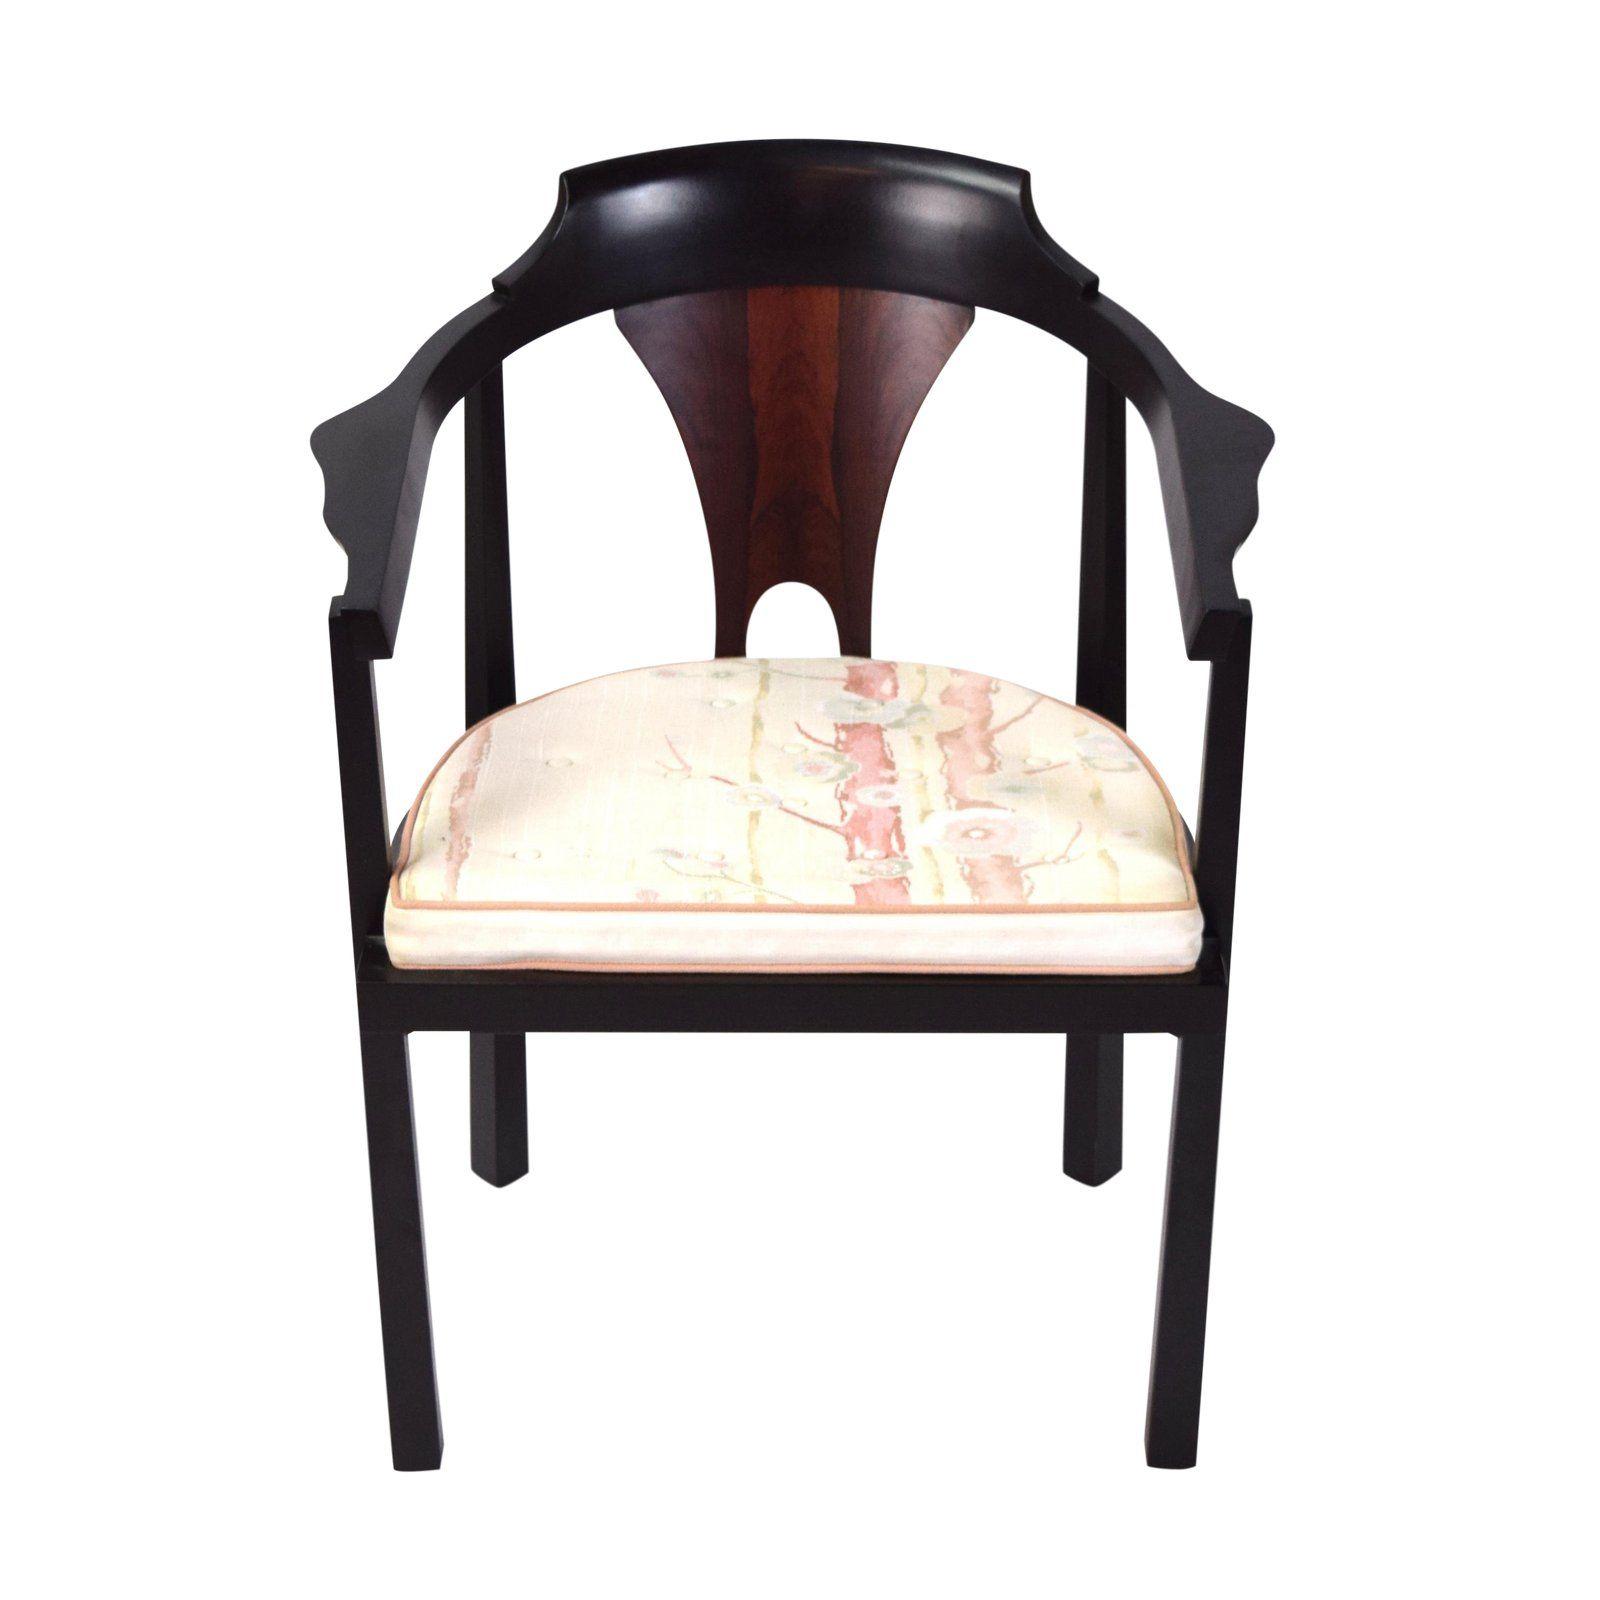 1960s Mid Century Modern Edward Wormley Dunbar Horseshoe Armchair